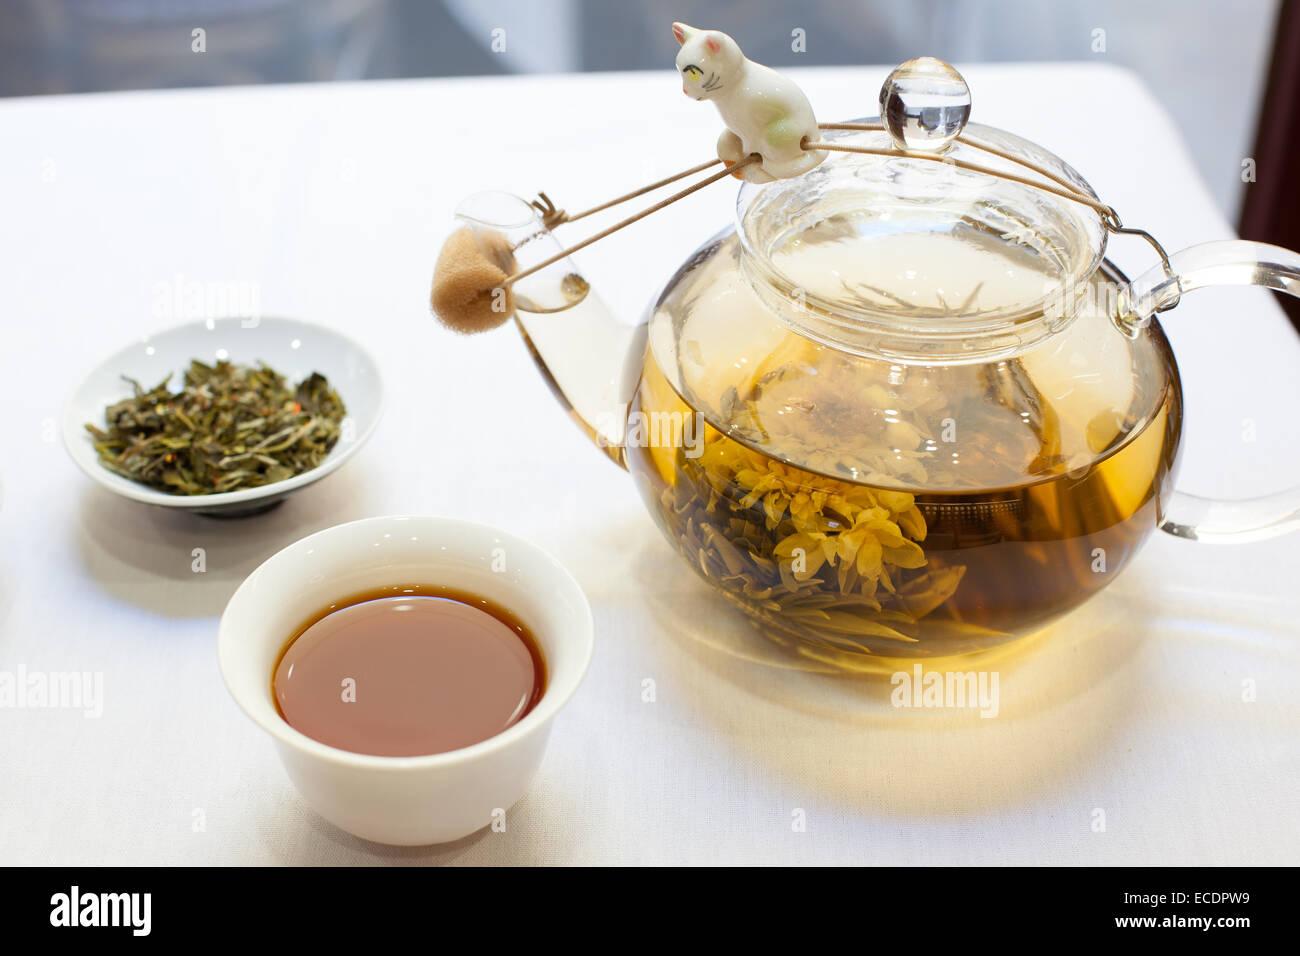 Cup of tea, loose leaf tea, and glass tea pot on white tablecloth - Stock Image